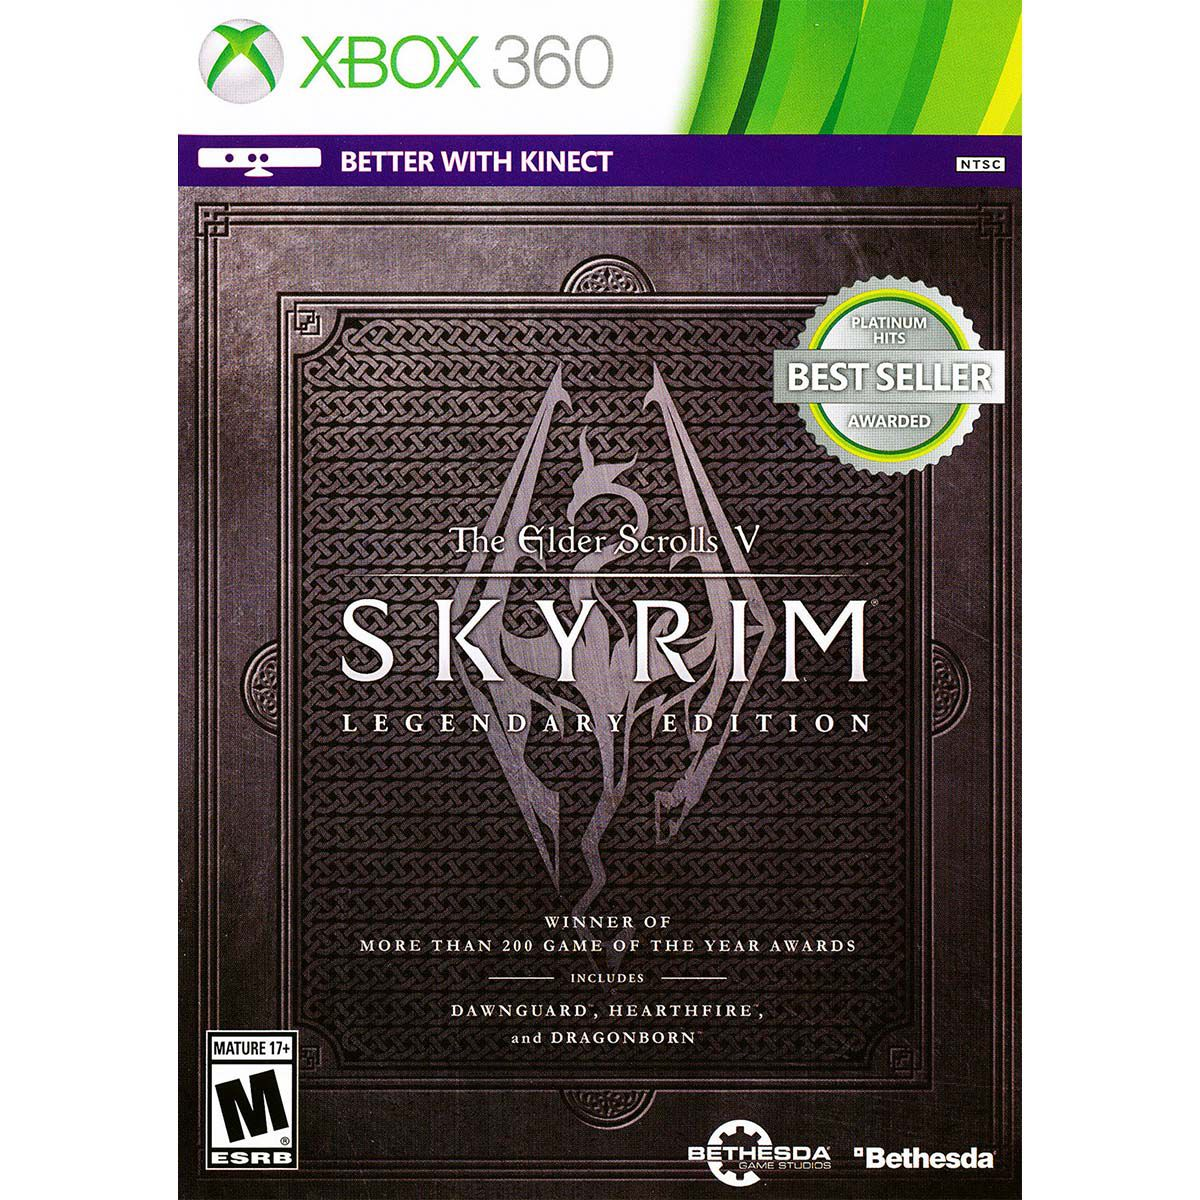 The Elder Scrolls V Skyrim - Legendary Edition - Xbox360